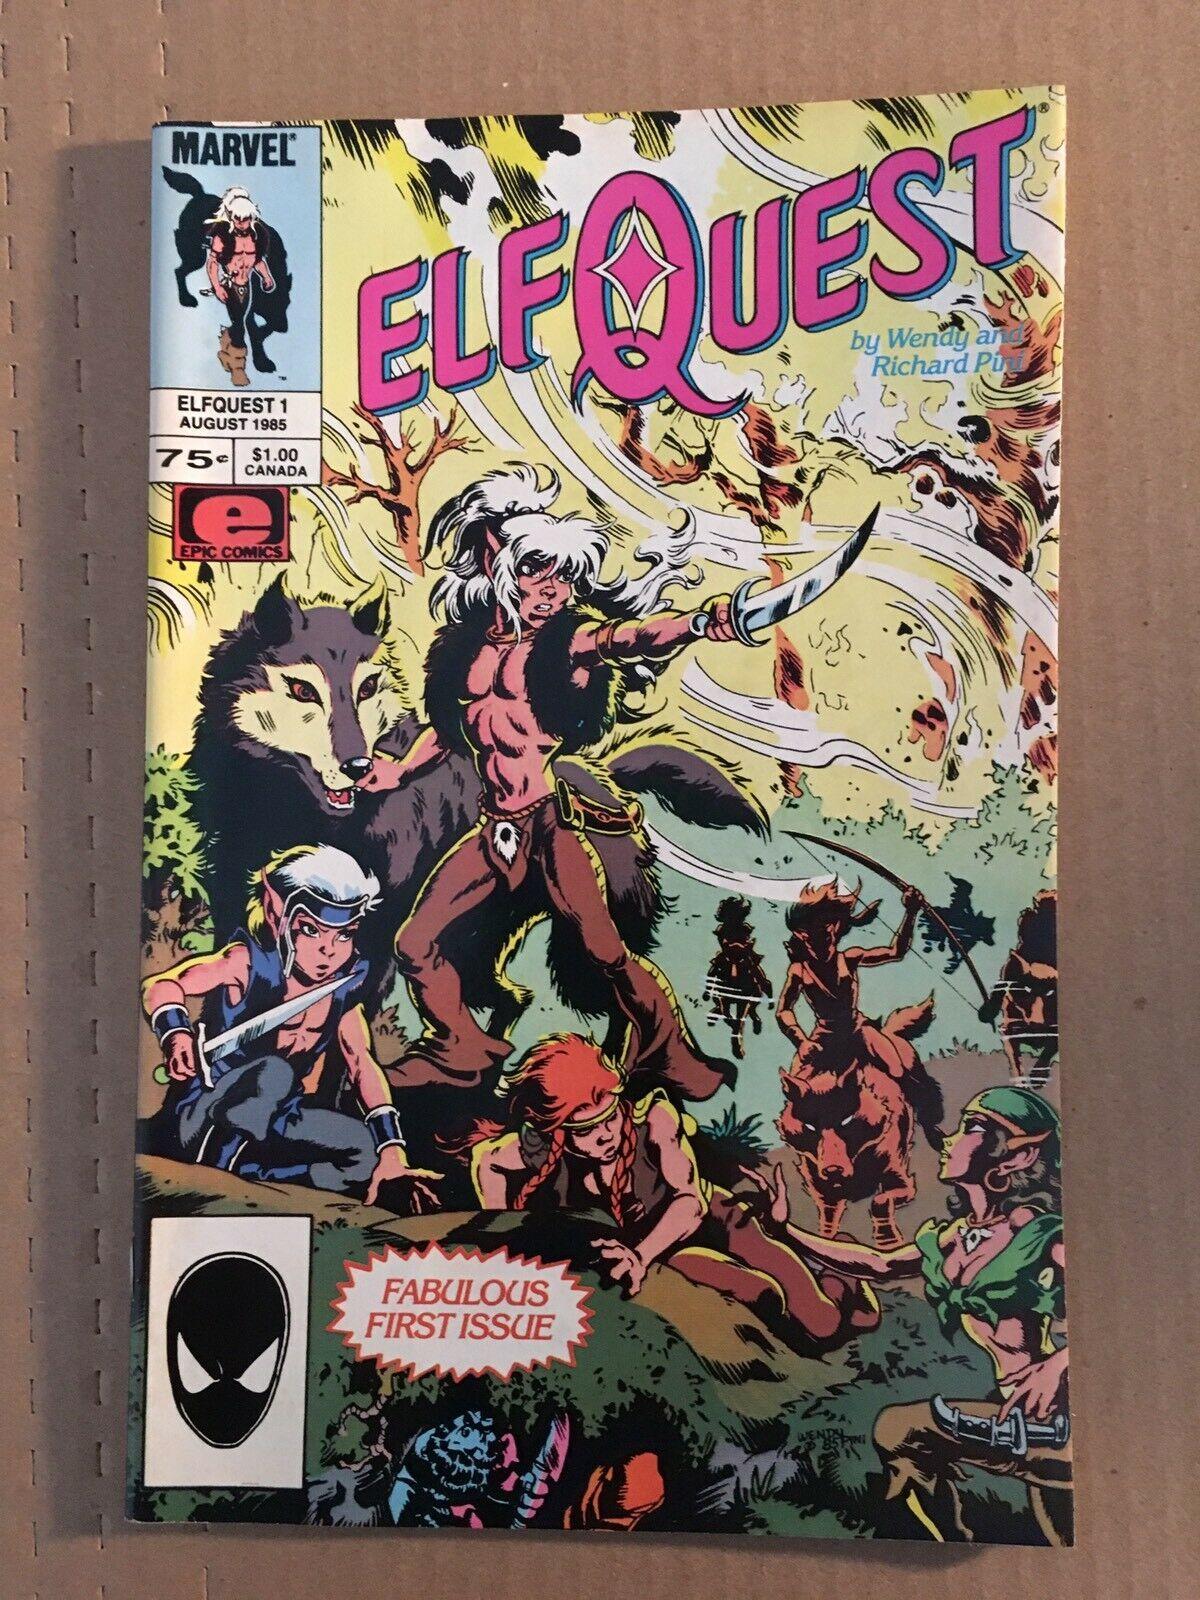 Elfquest #1 Marvel Comic Book 1985 VF+ Condition